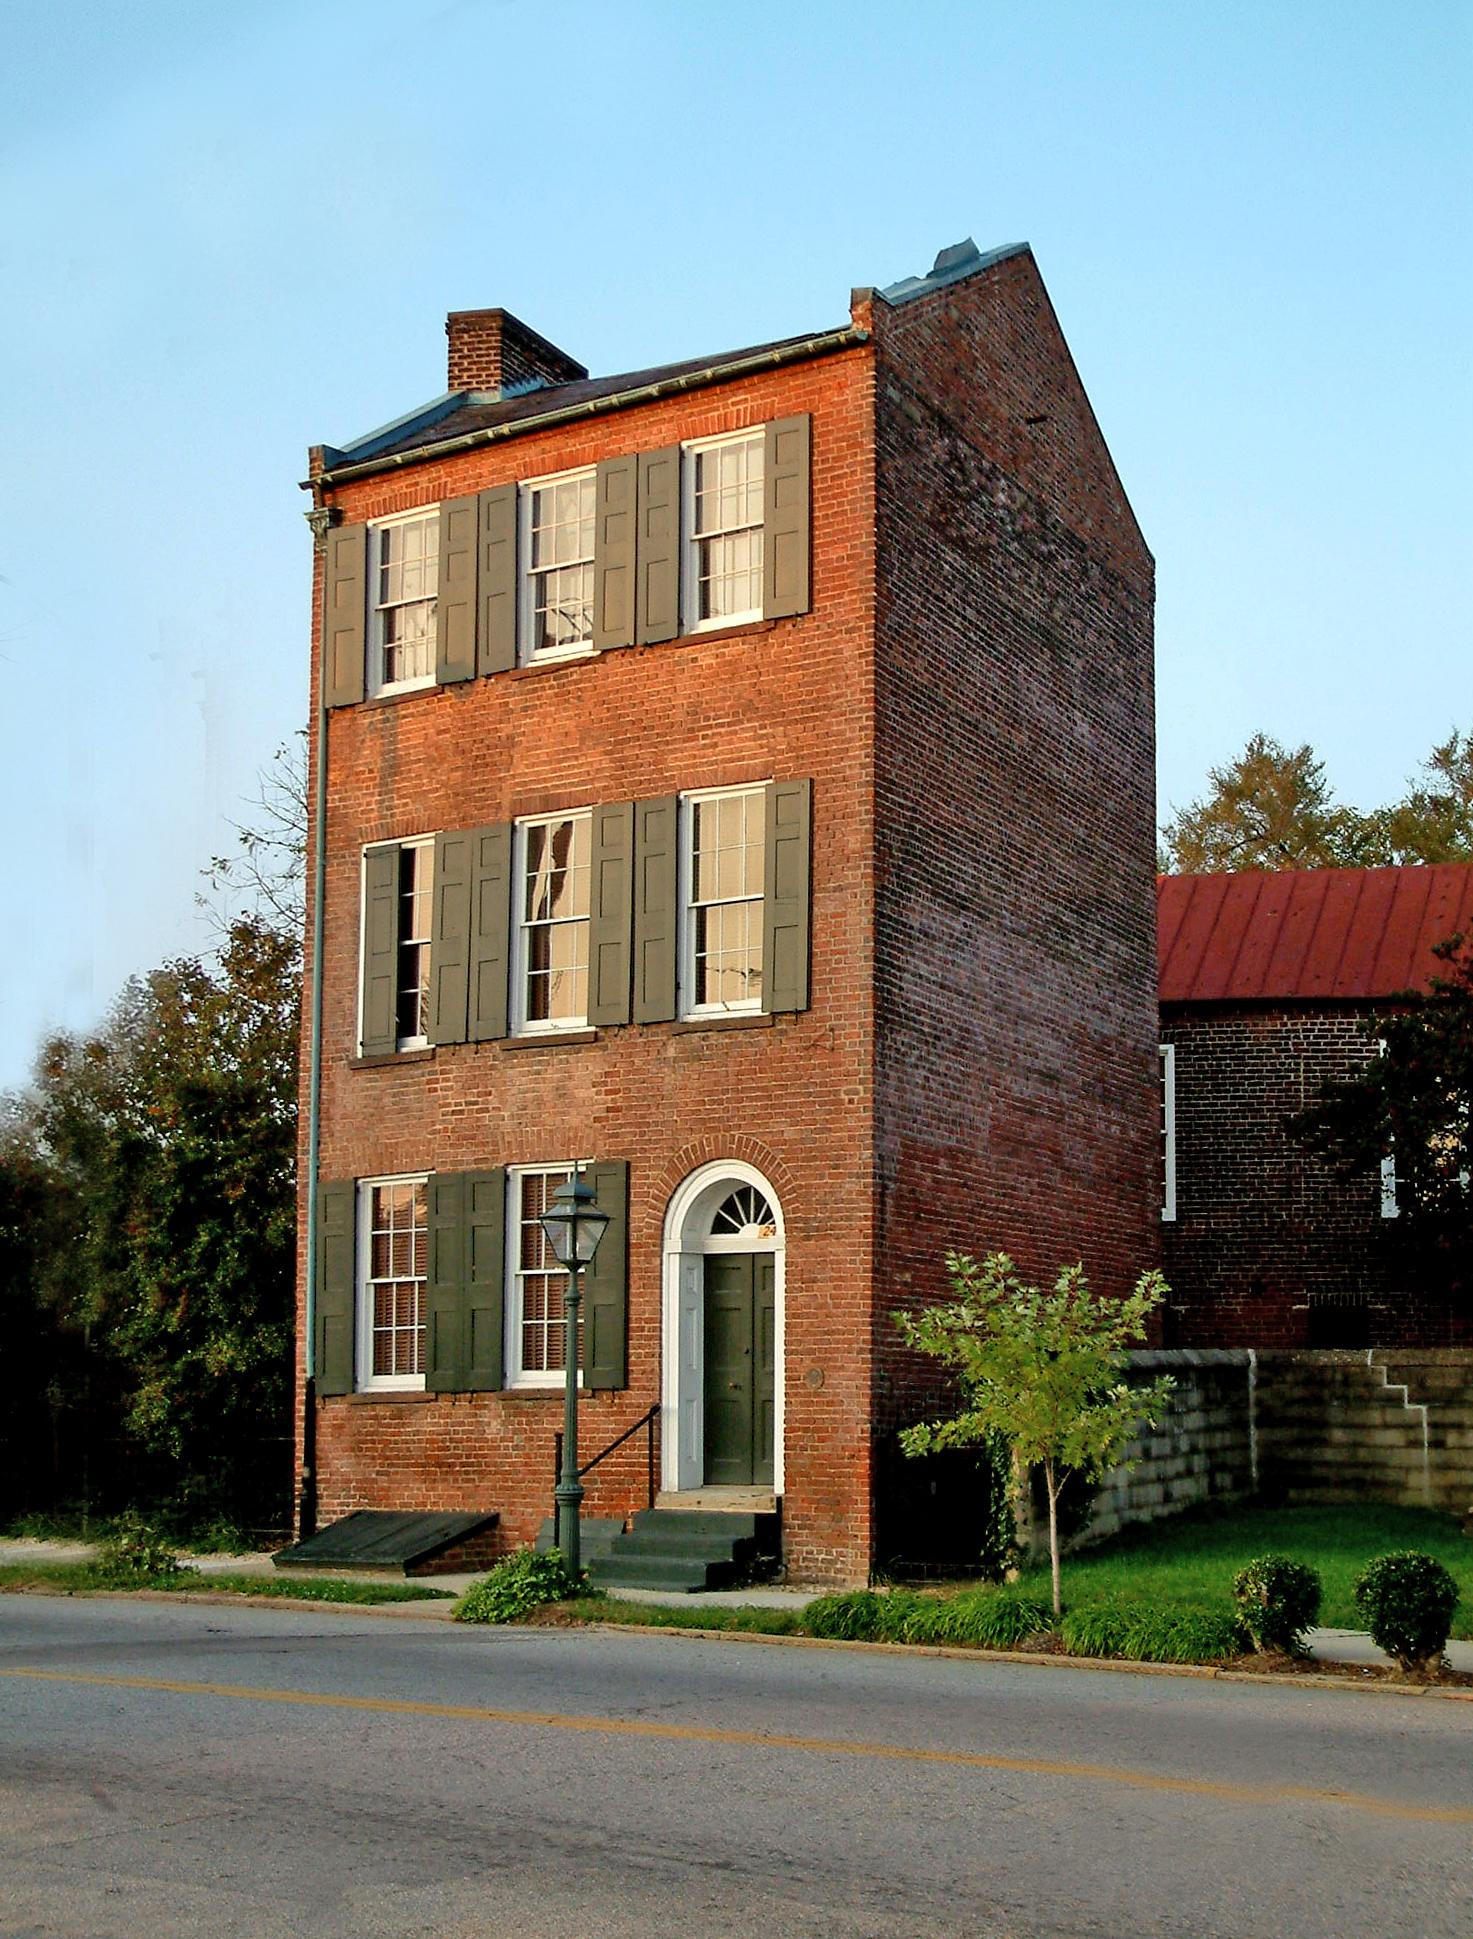 Trapezium House,1817